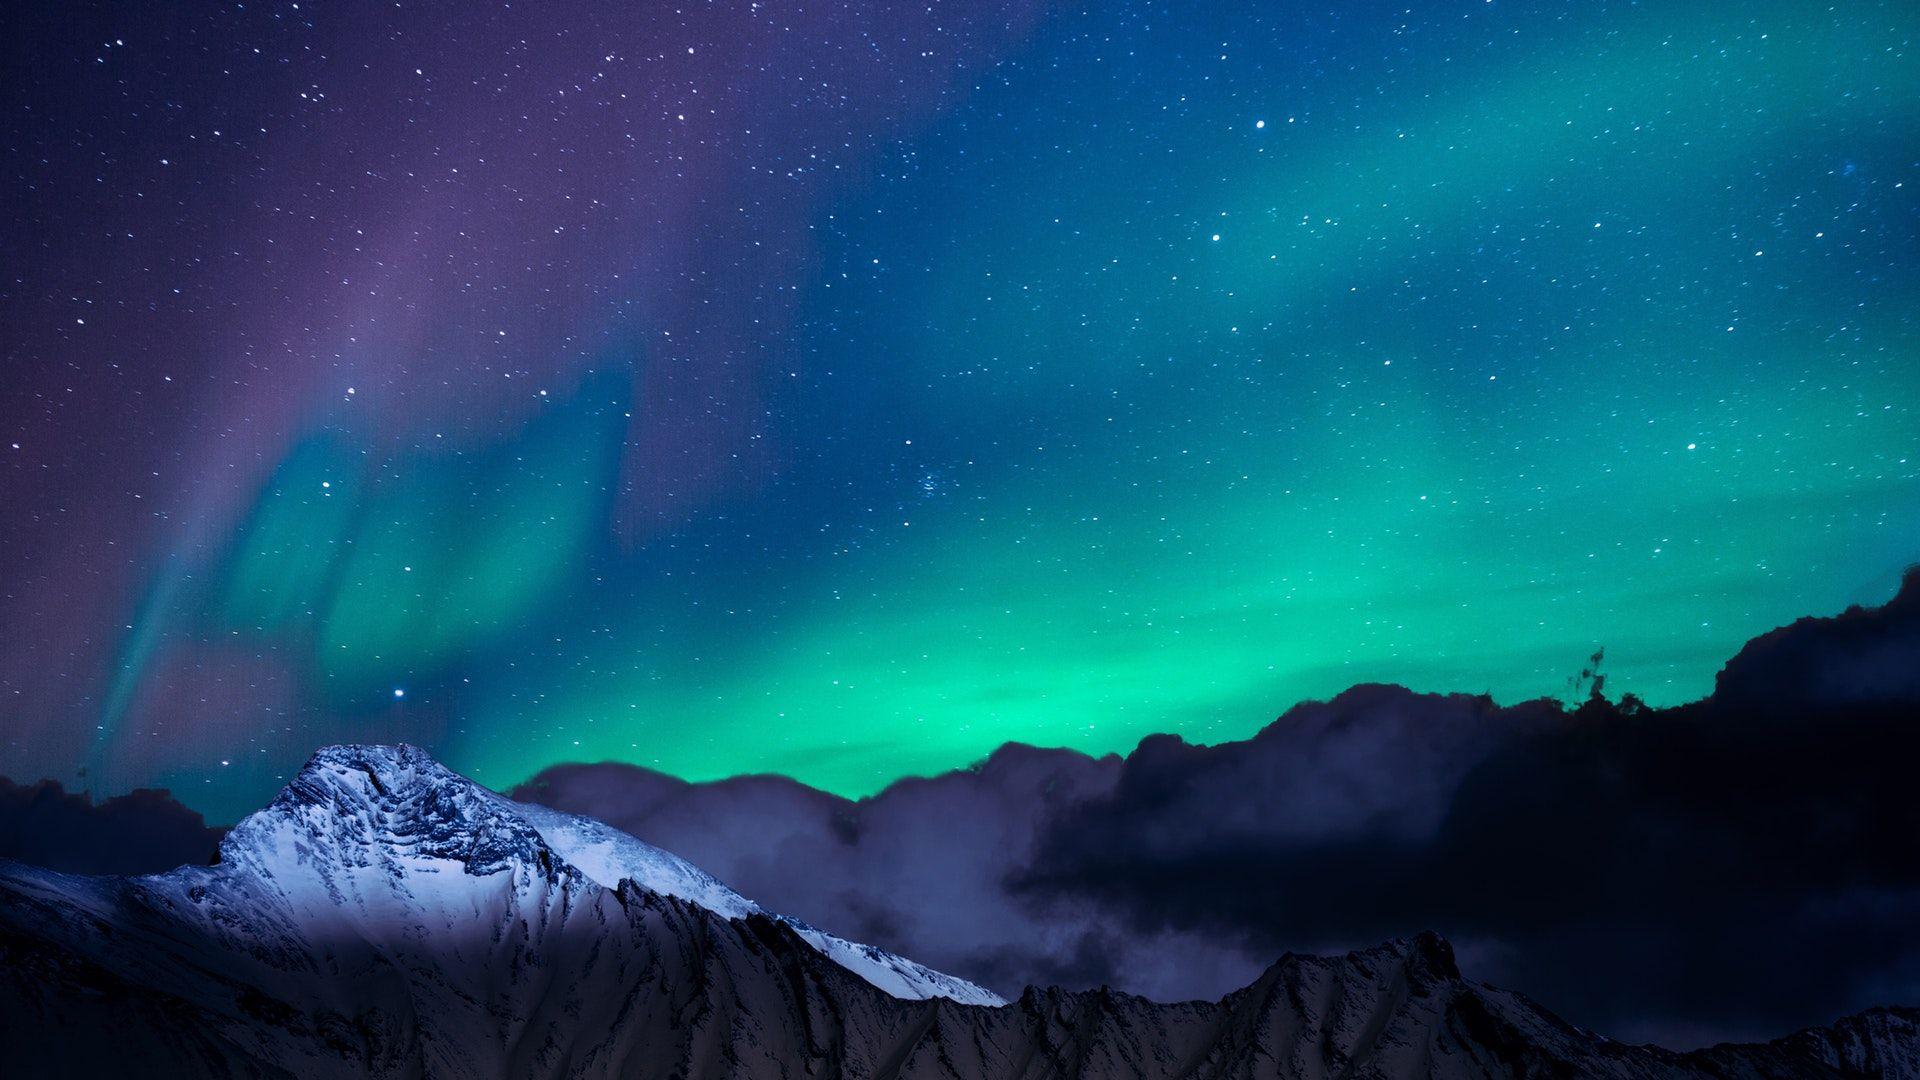 Landscape Photo Of Mountain With Polar Lights 1920x1080 Background Hd Wallpaper Polar Light Northern Lights